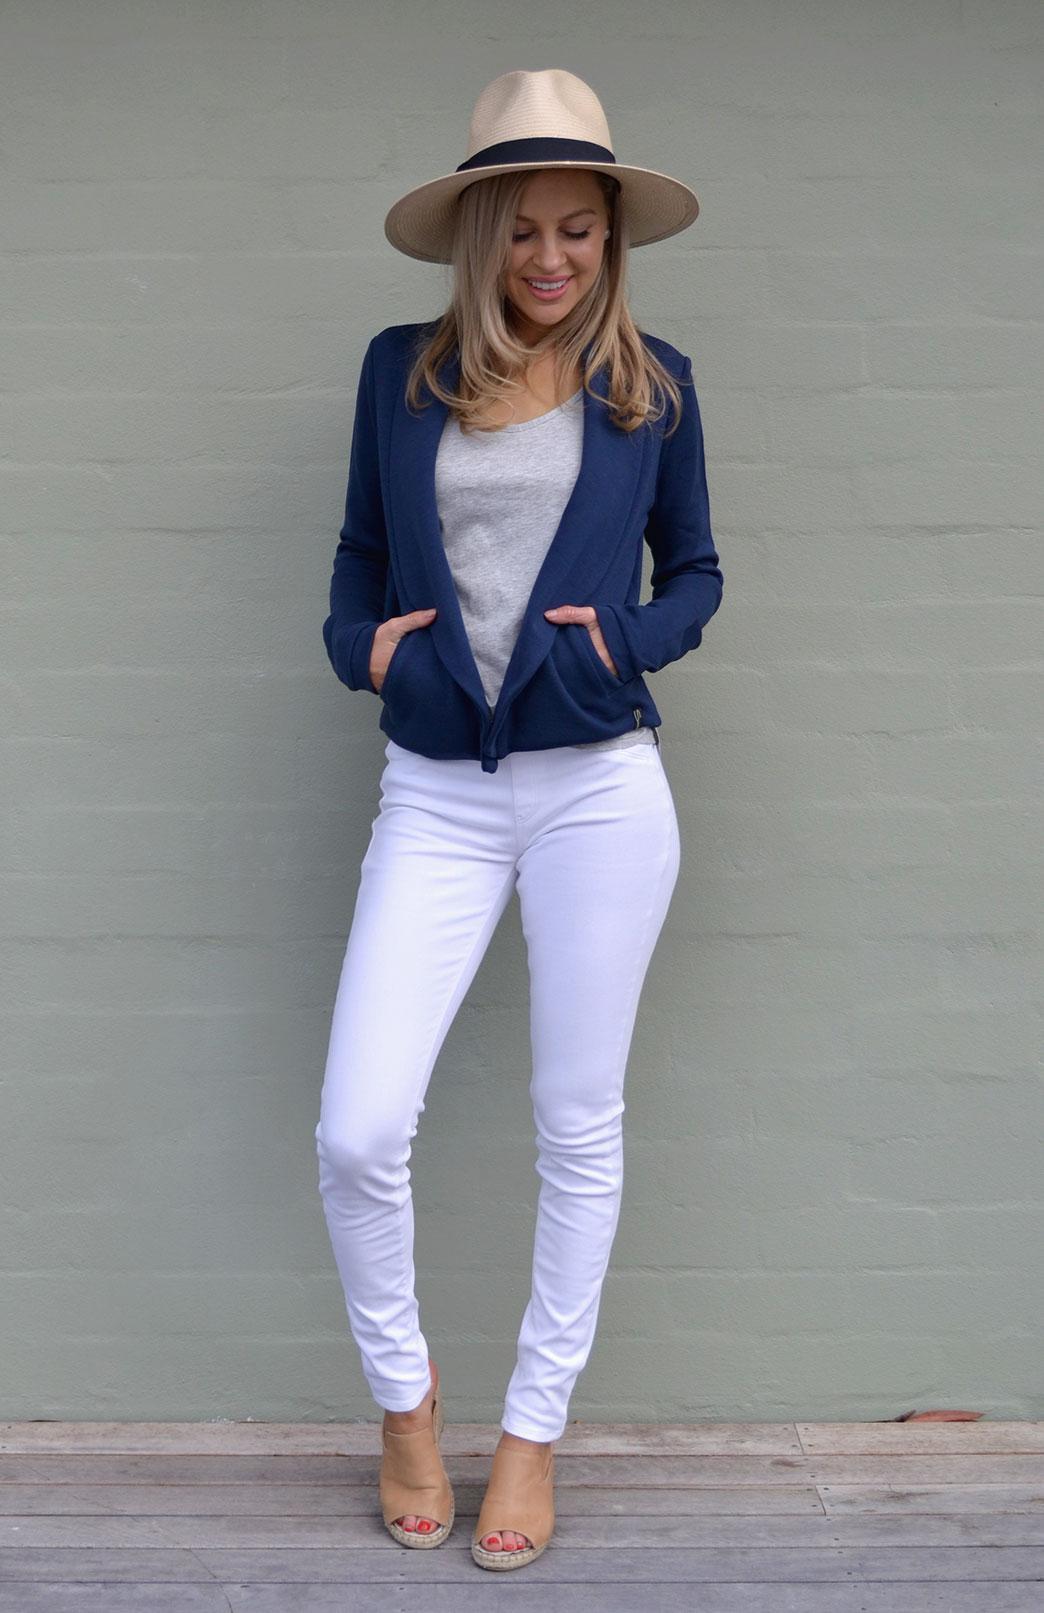 Lapel Jacket - Heavyweight - Women's Indigo Blue Wool Lapel Jacket with side pockets and long sleeves - Smitten Merino Tasmania Australia